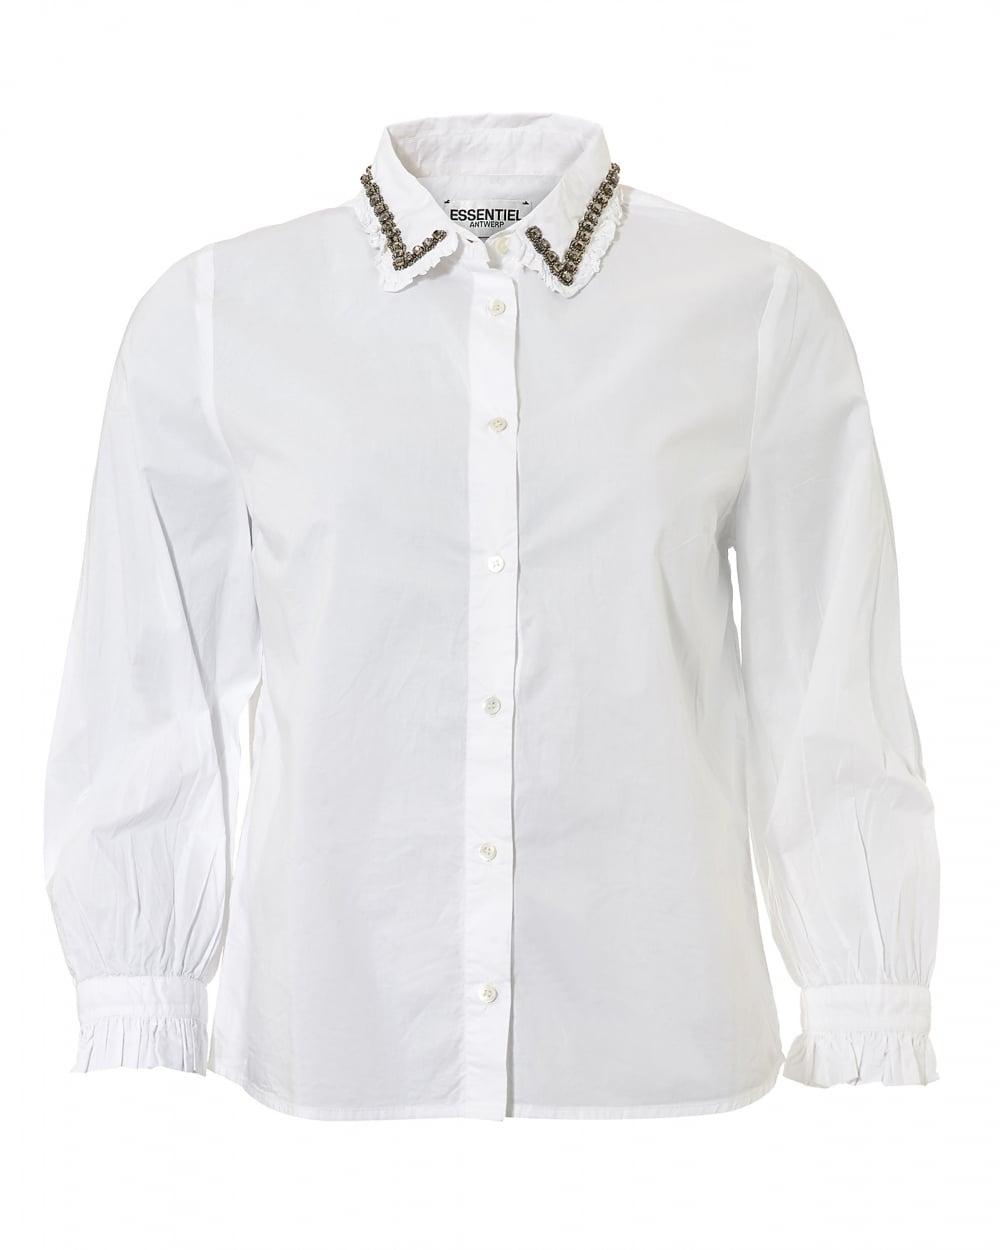 Essentiel Antwerp Womens Odakota5 Jewelled Collar Pin Tuck White Shirt